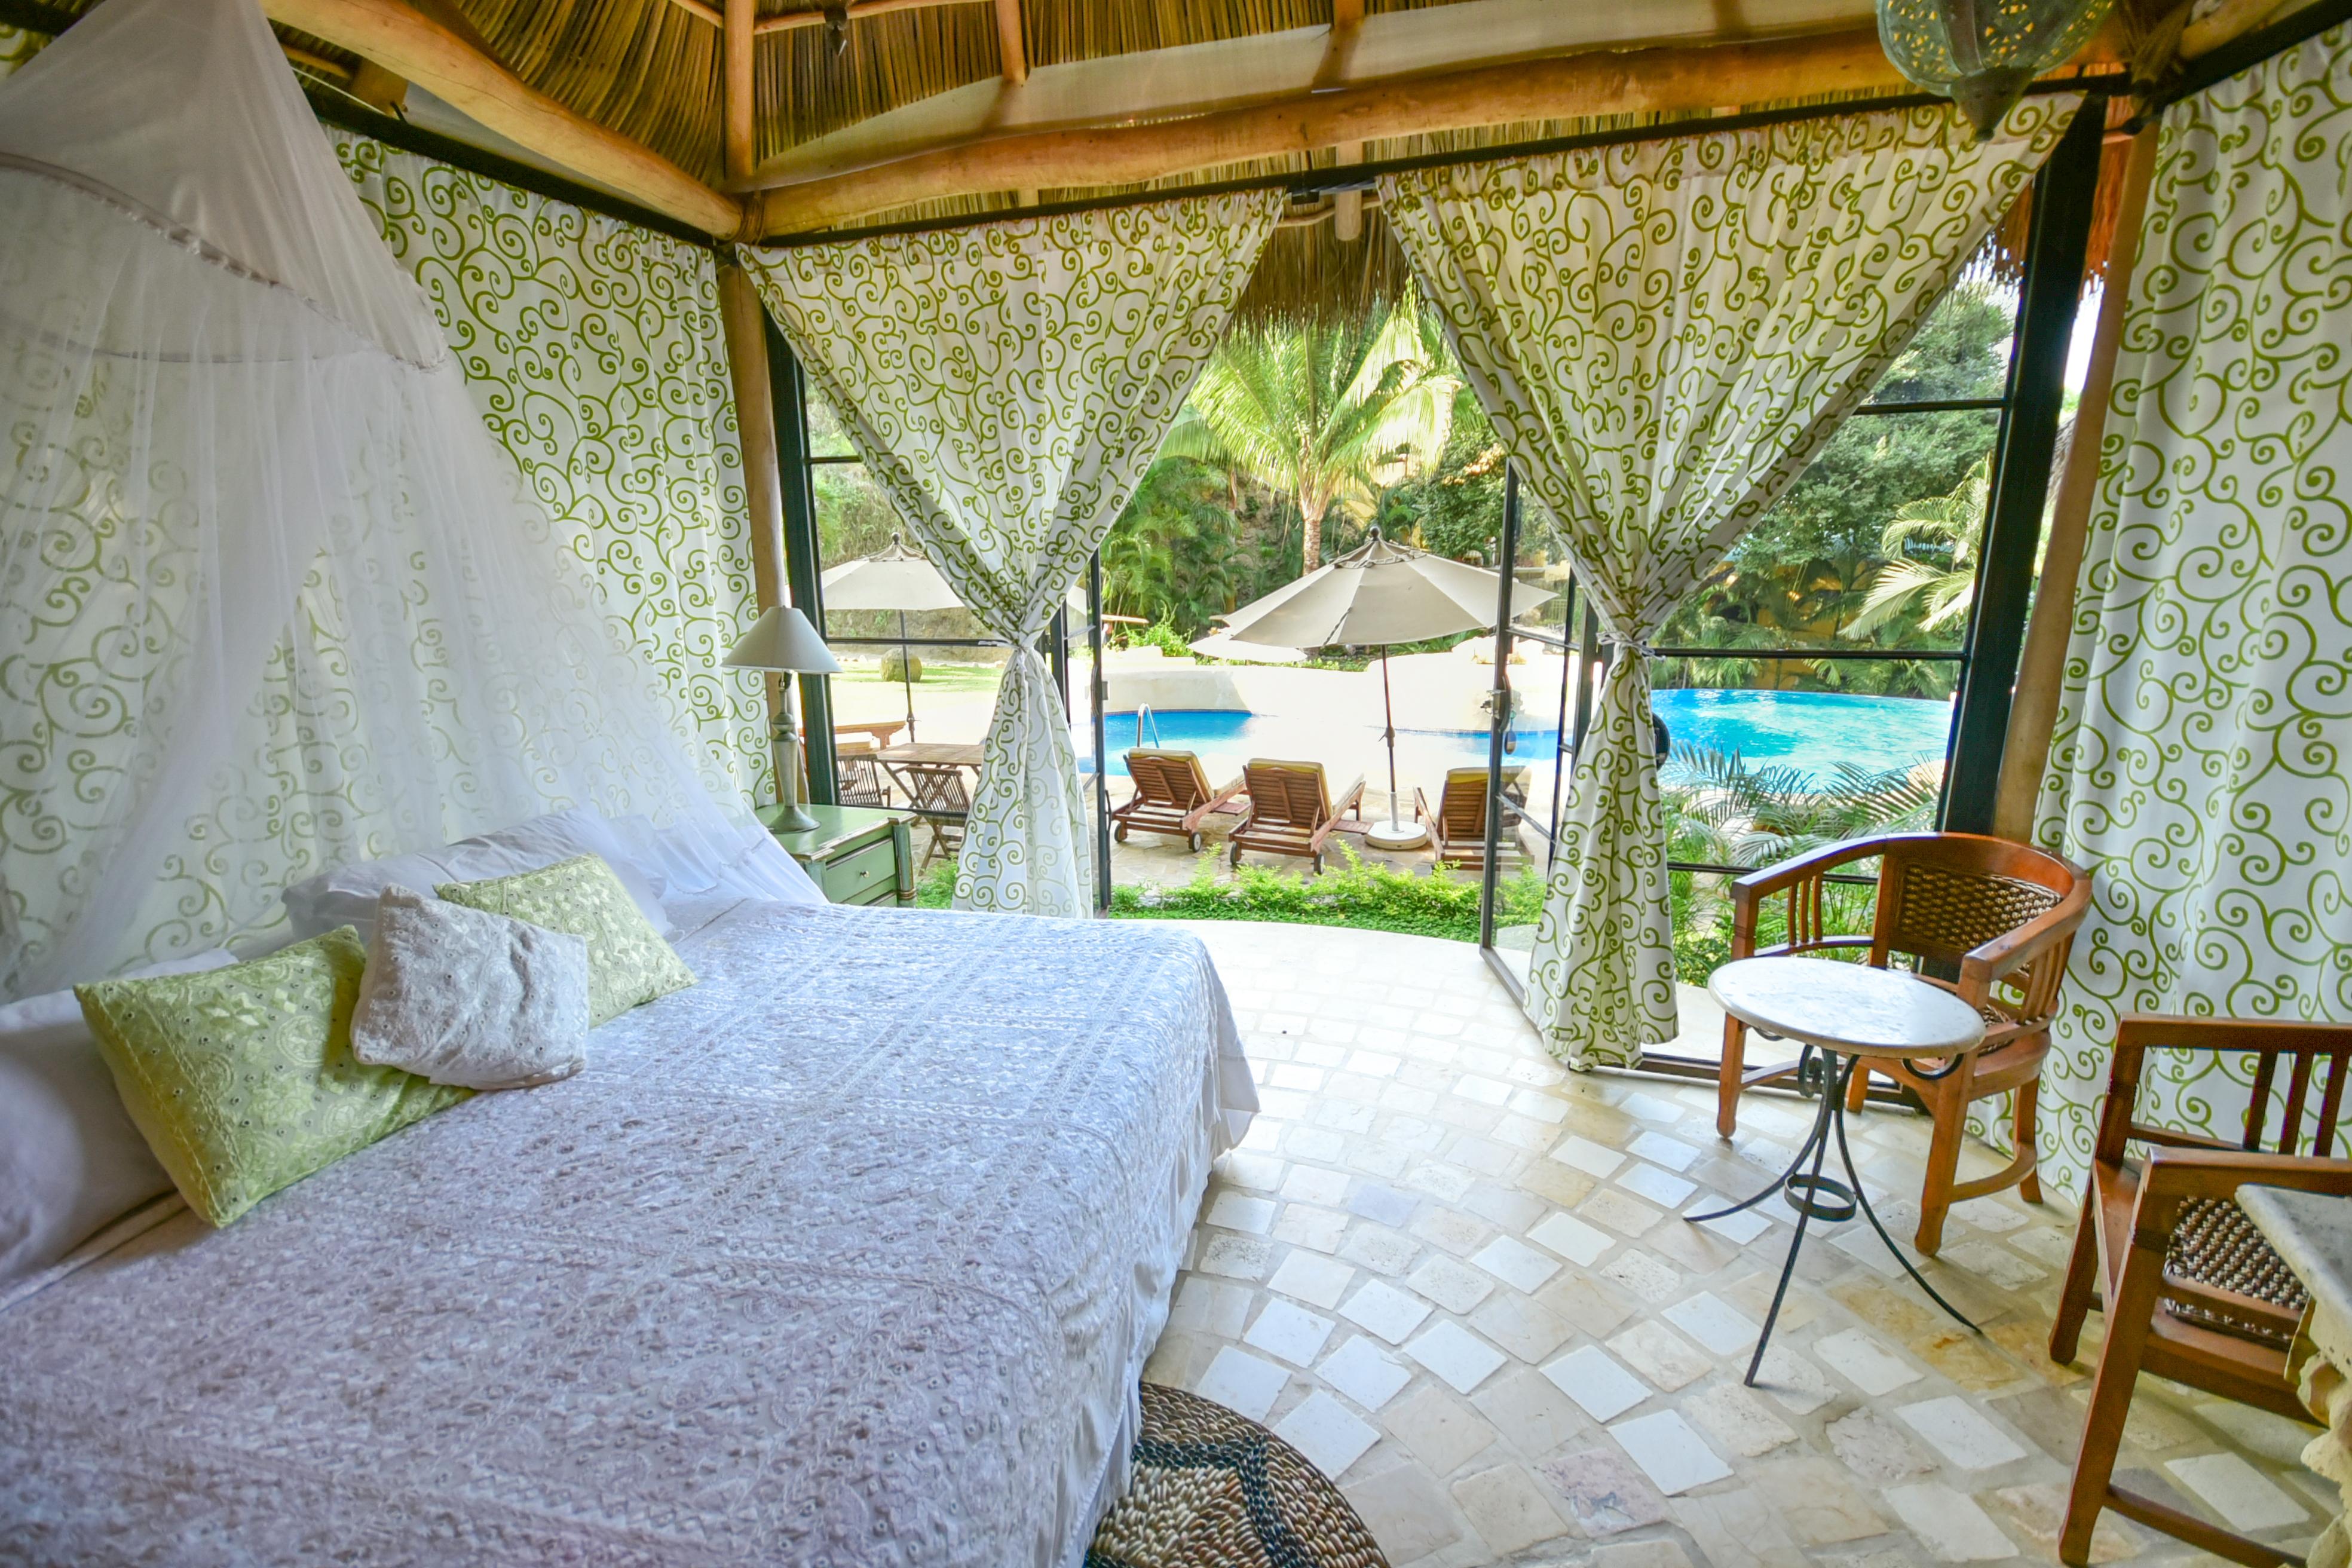 Villa Besito at Amor Boutique Hotel in Sayulita Mexico. Pretty, romantic one bedroom vacation rental.